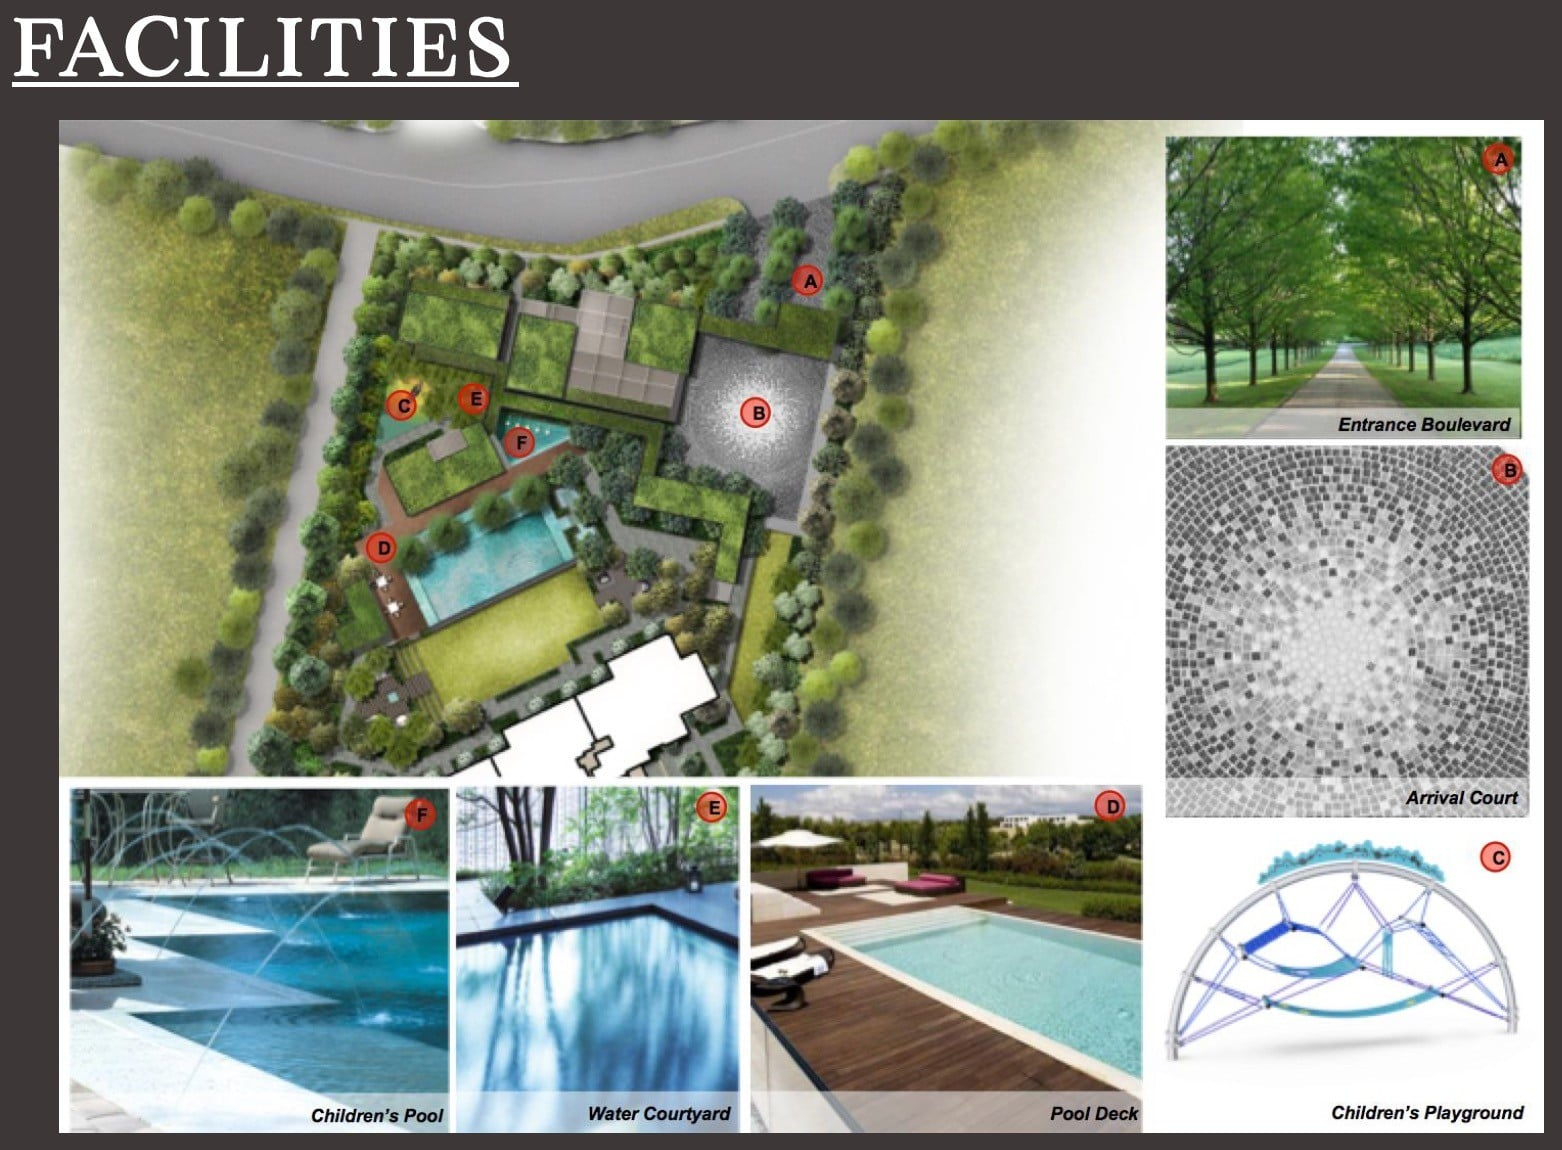 Meyer-Mansion-Facilities